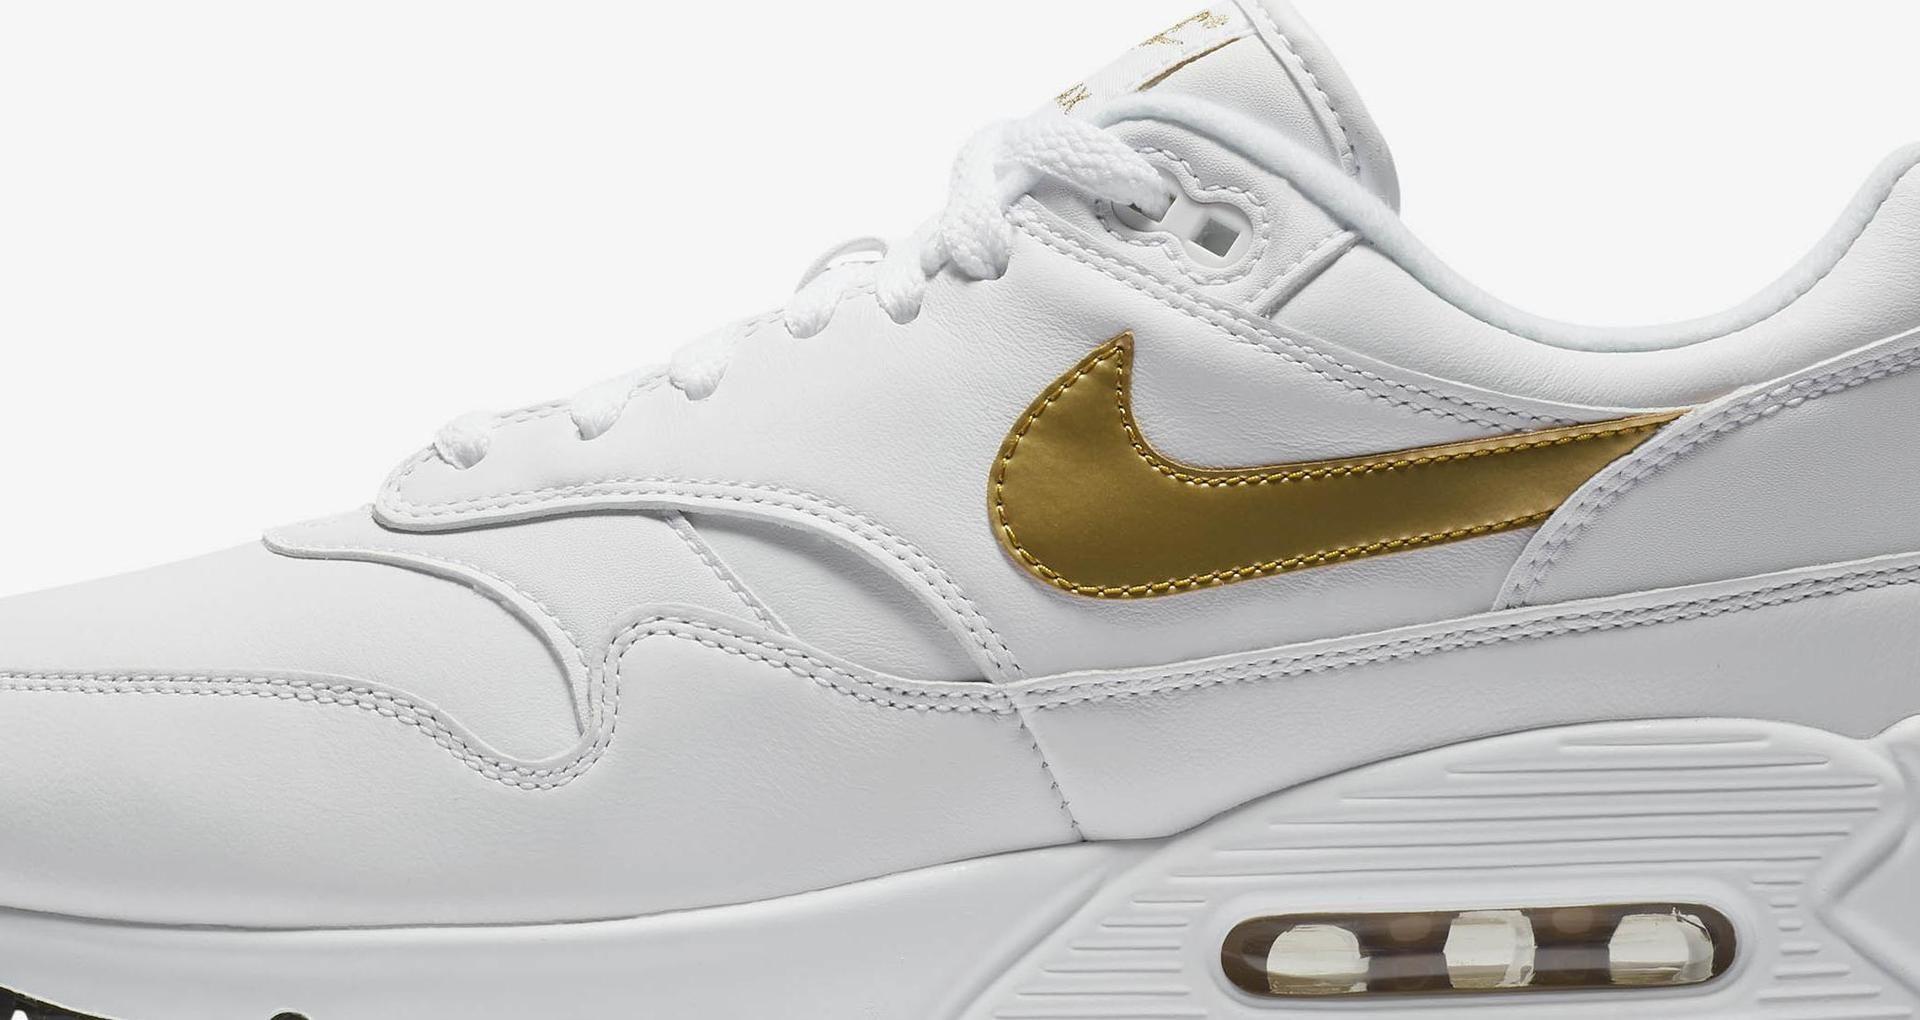 Nike Air Max 901 'White & Metallic Gold' Release Date